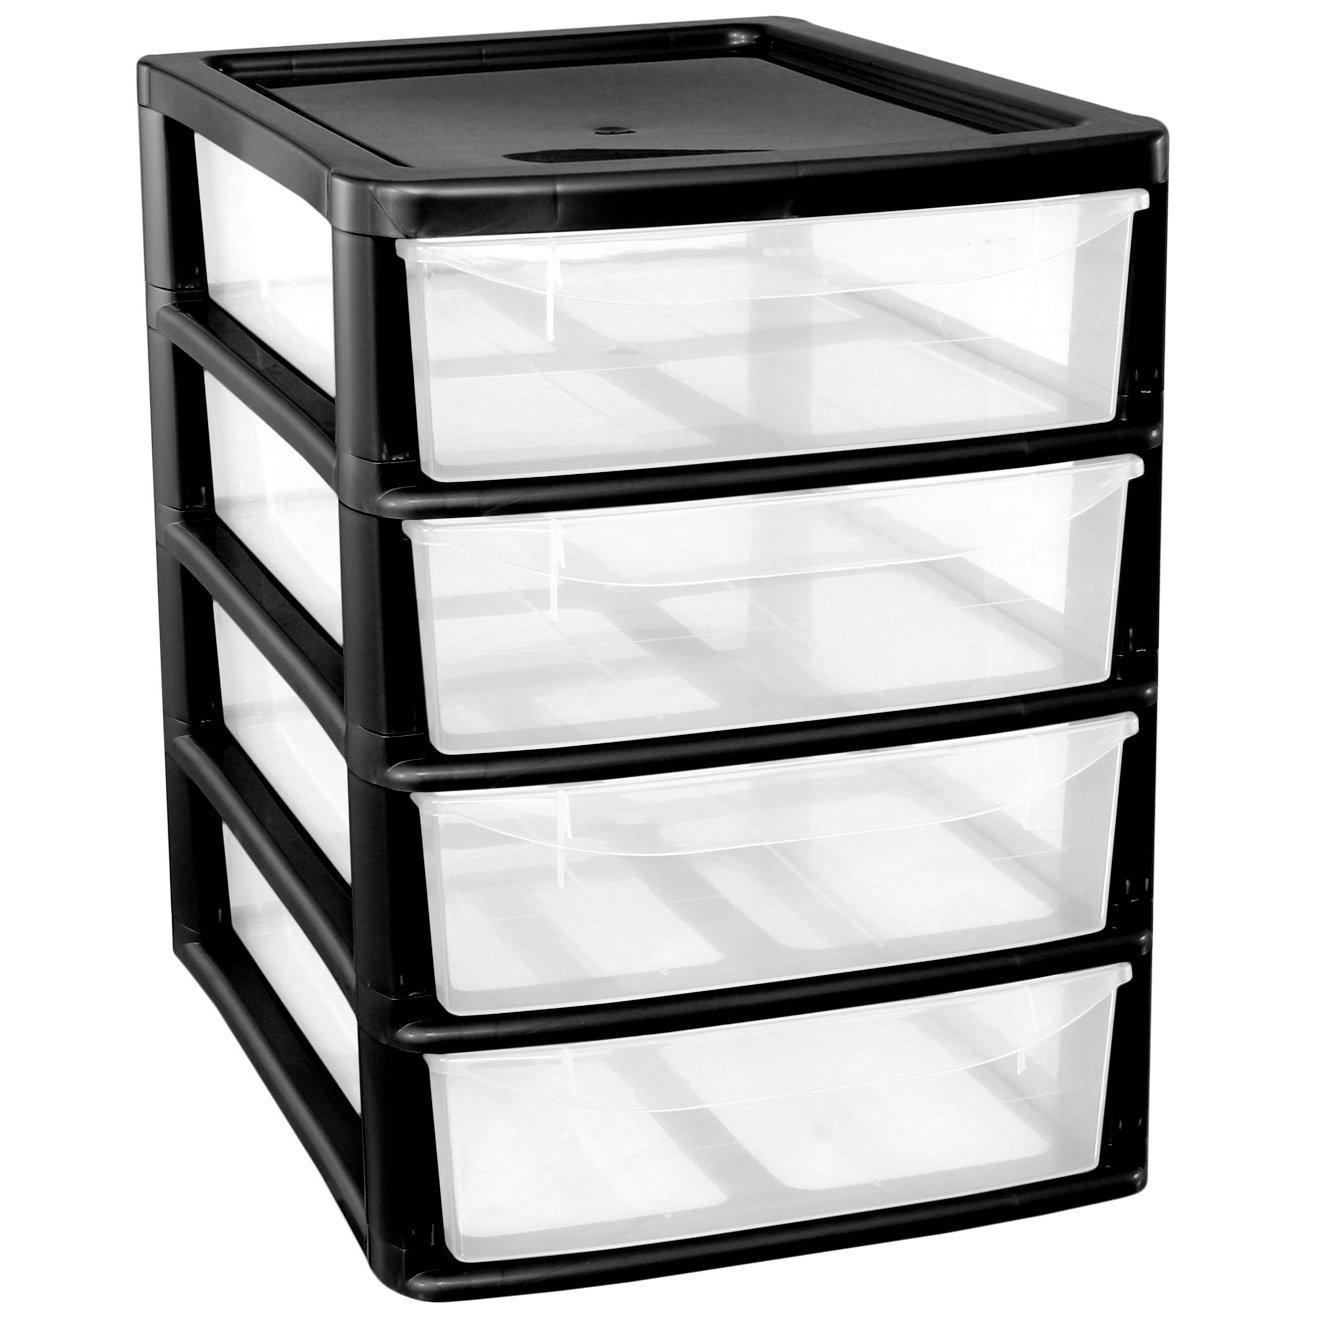 CrazyGadget A4 4Drawer Plastic Storage Unit Black- Homes/Office/Bedroom  sc 1 st  Amazon UK & Plastic Storage Units with Drawers: Amazon.co.uk